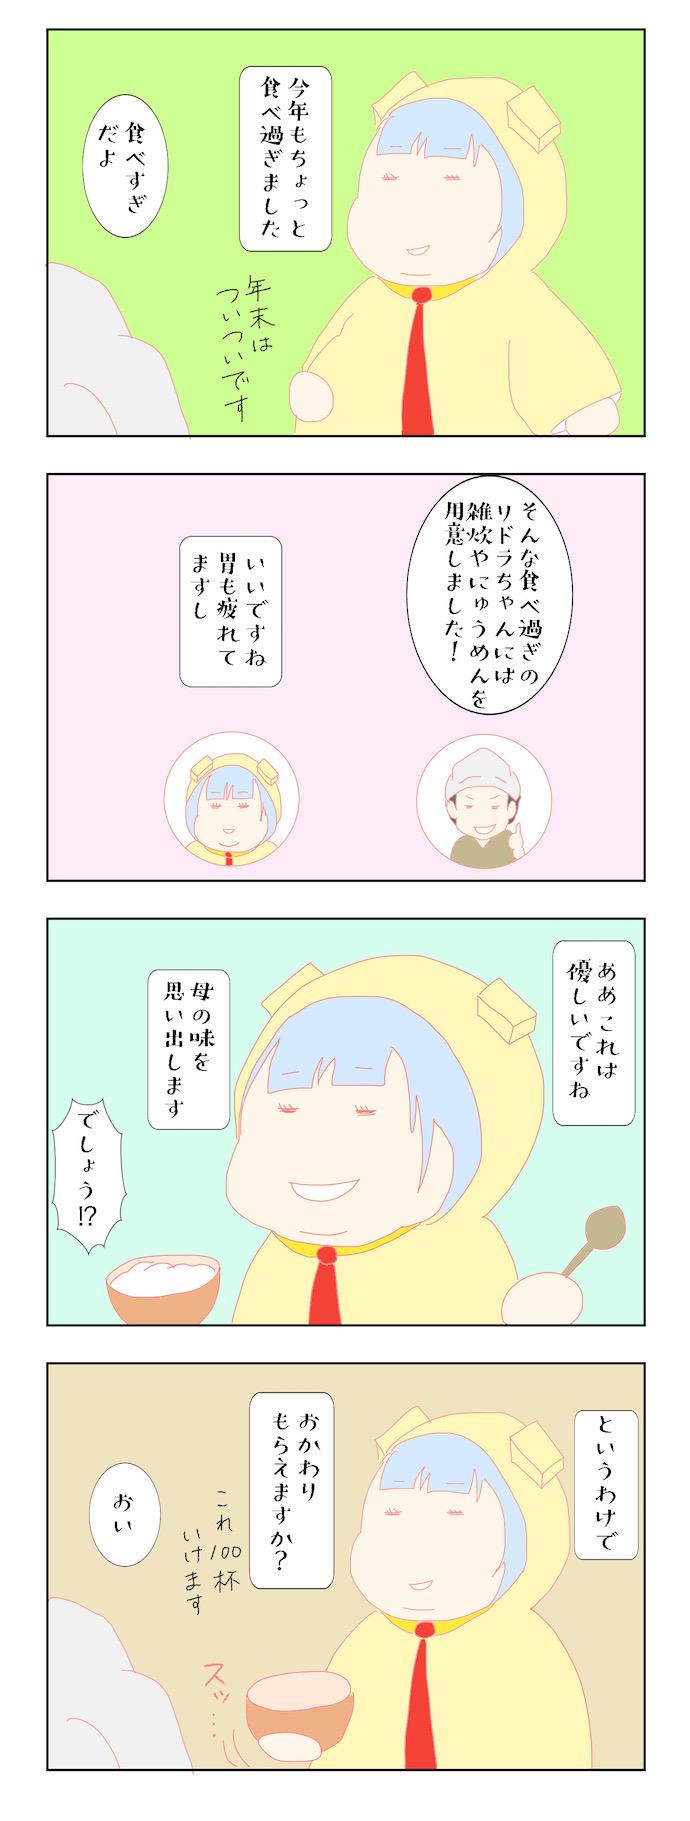 kimura_1911_01